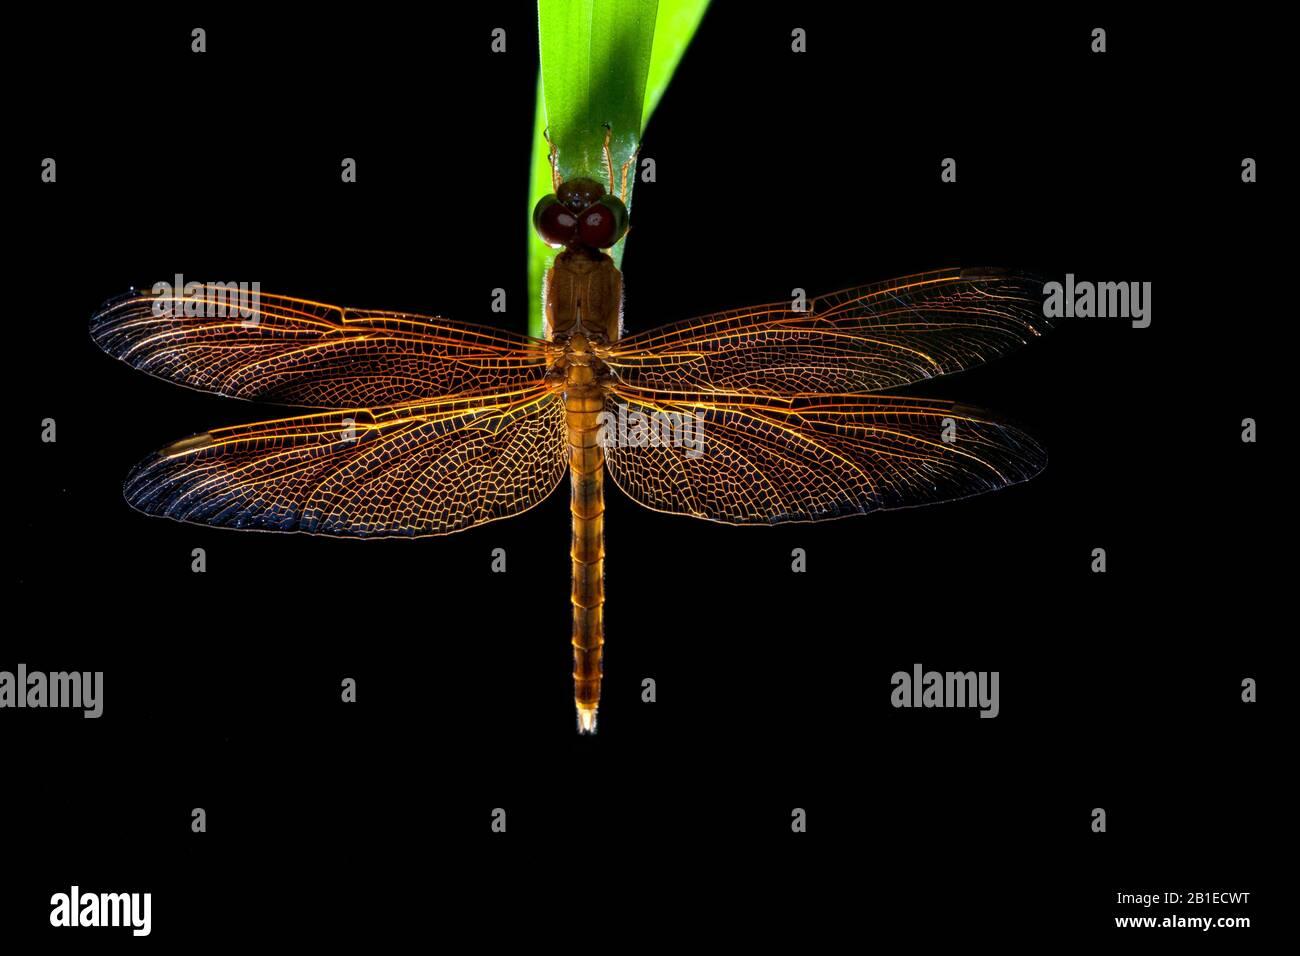 Odonata ; Backlit dragonfly ; Backlit portrait of a sleeping dragonfly ; Singapore Stock Photo